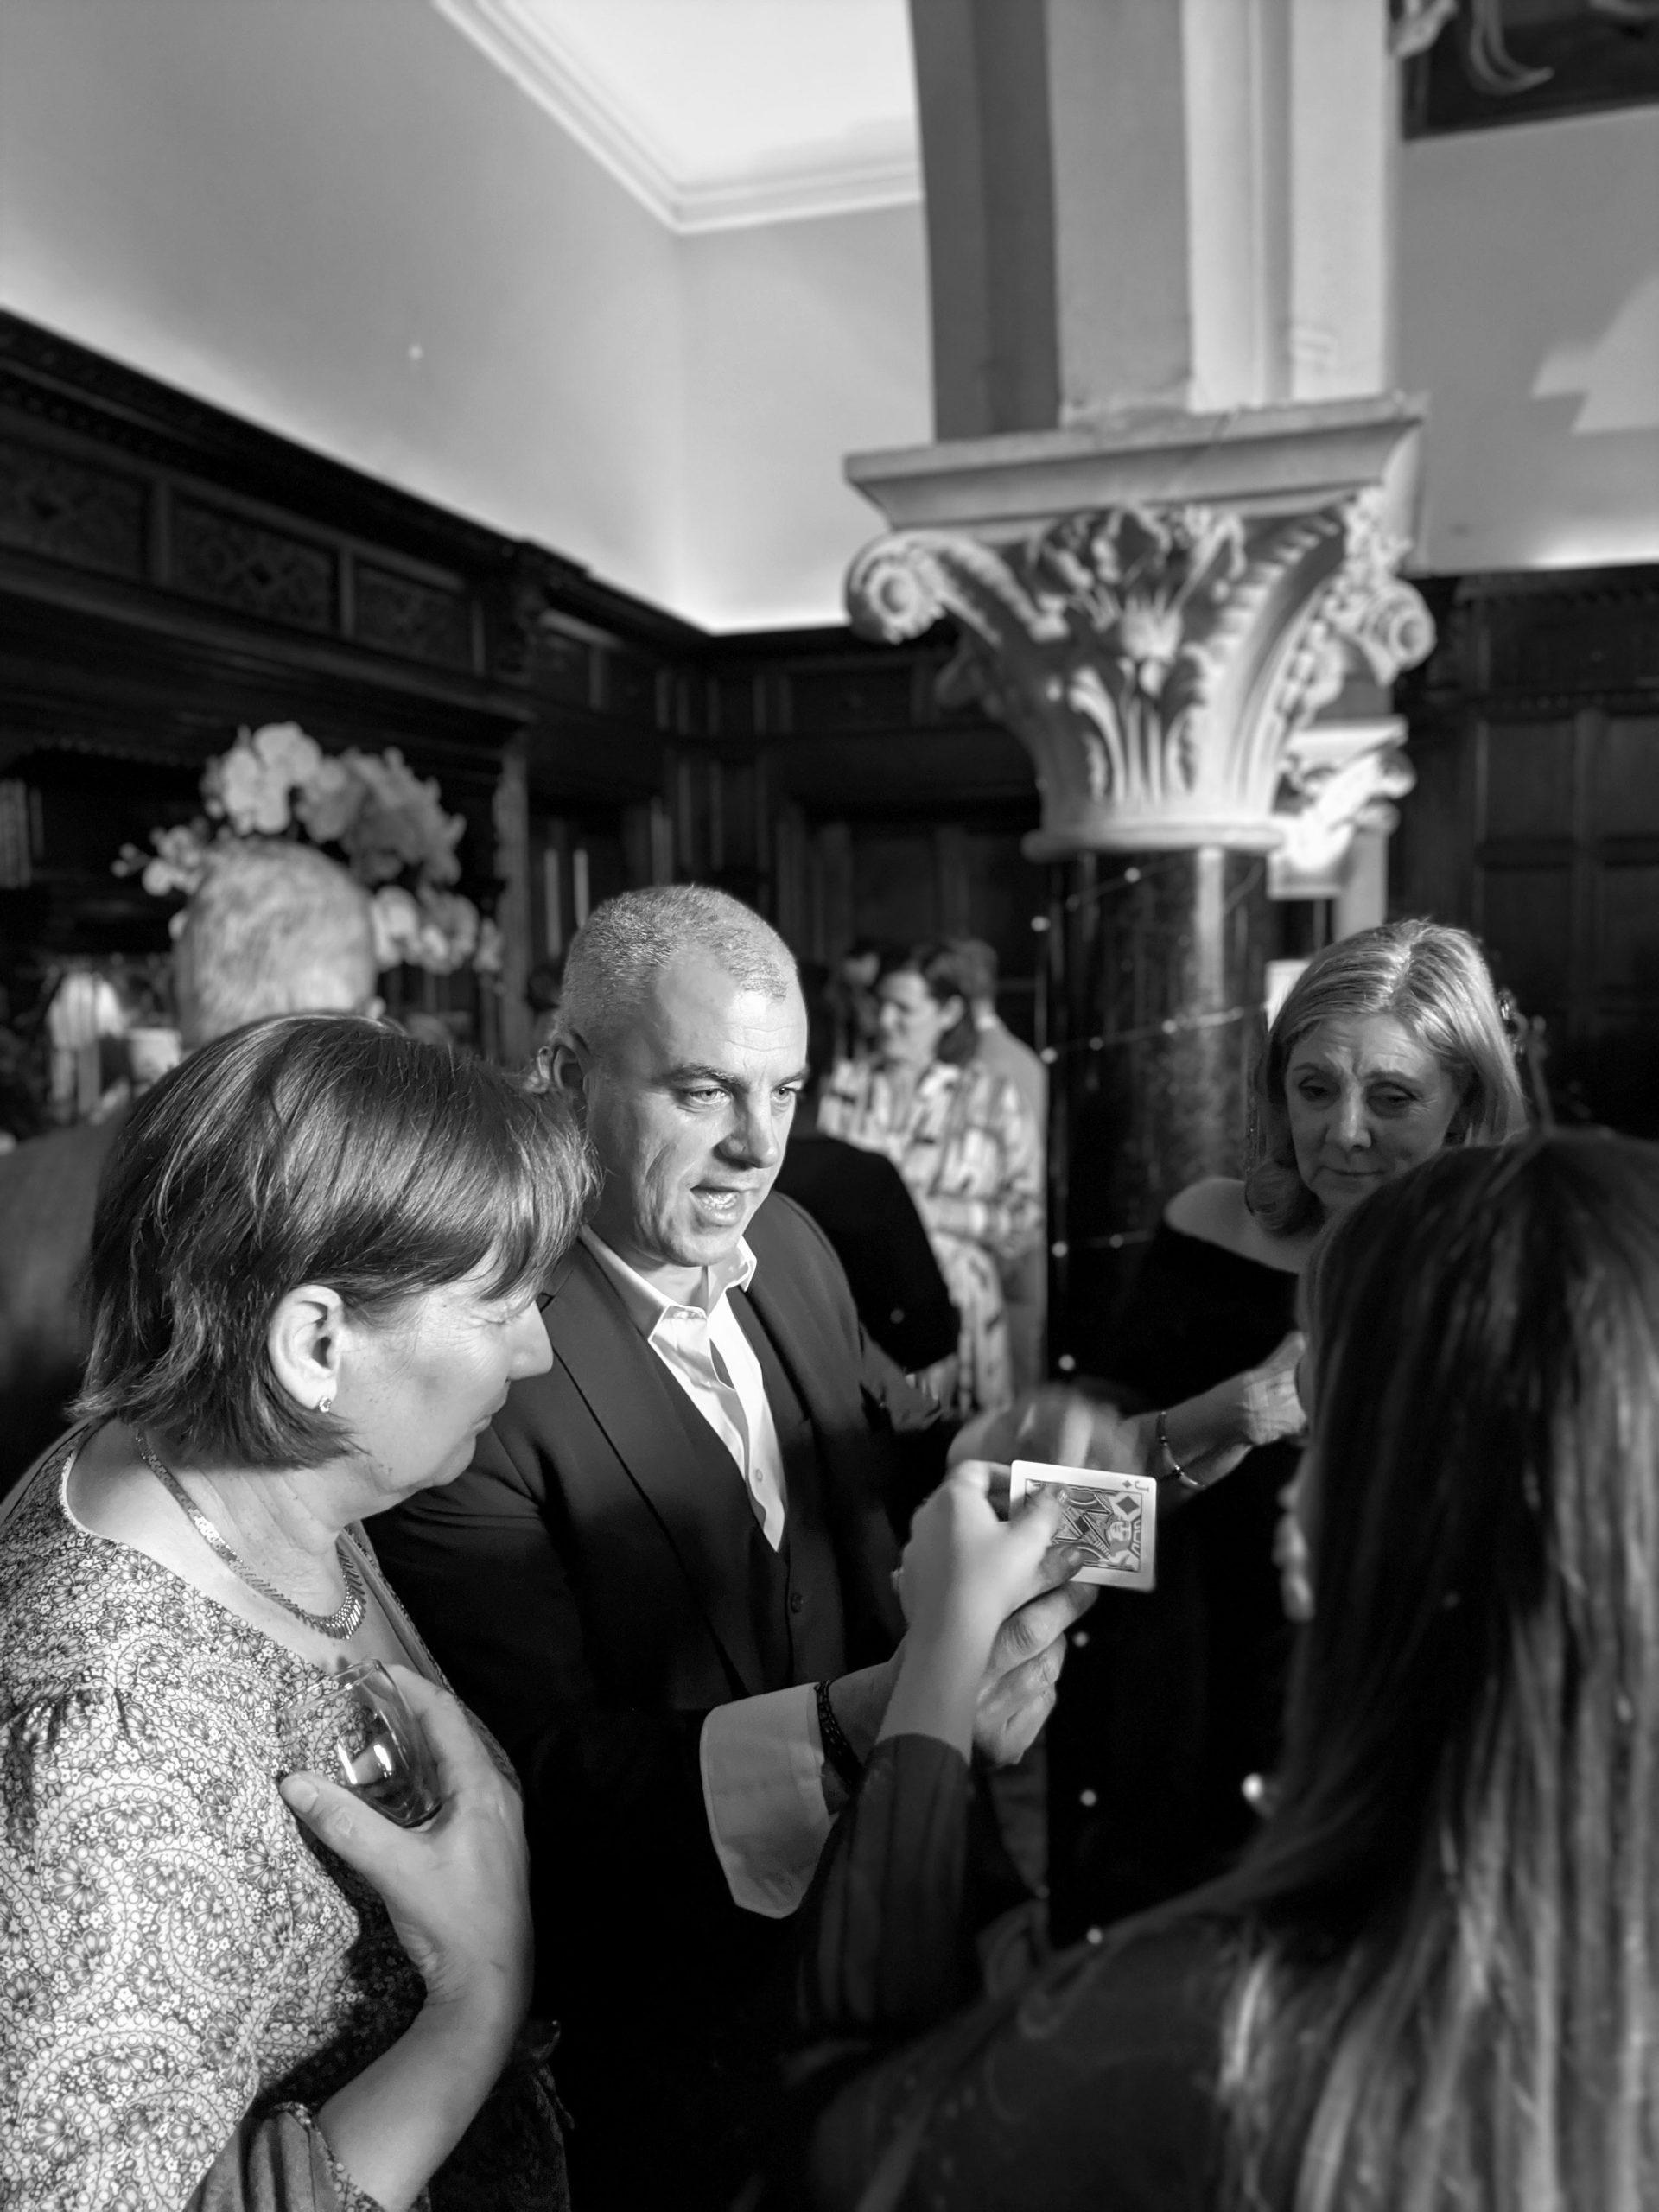 Huntsham Court - wedding day fun, magician